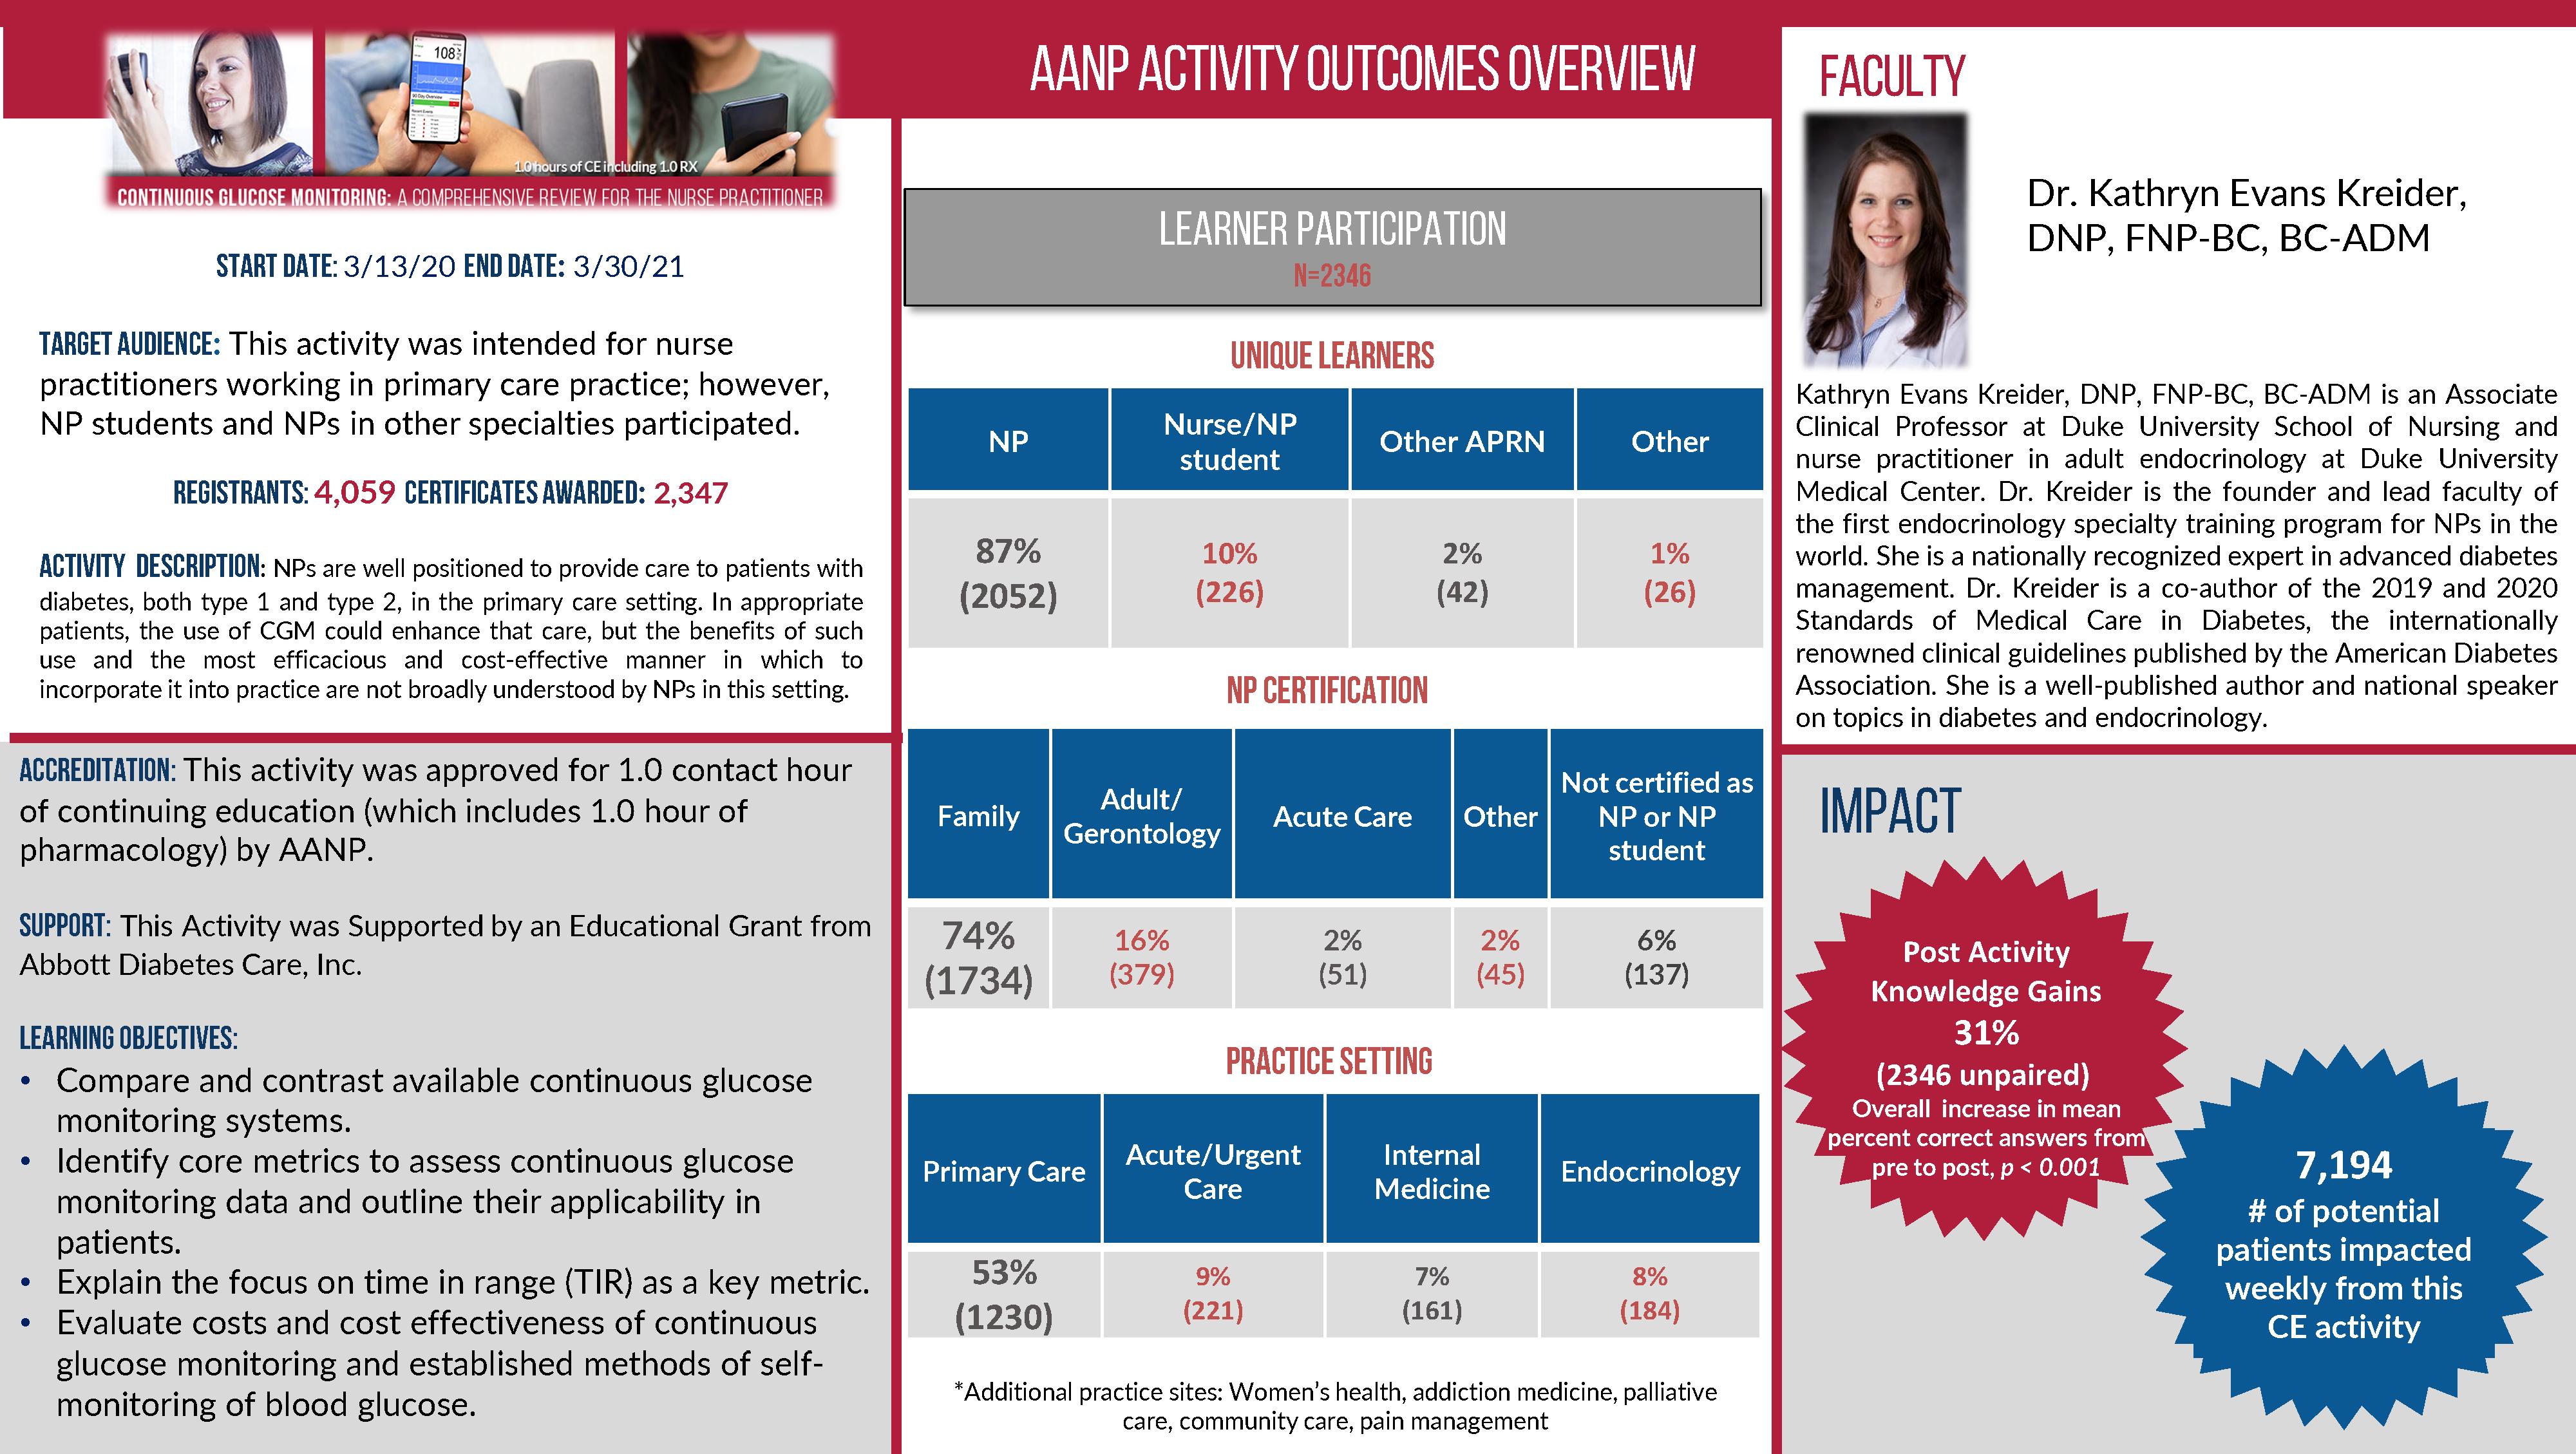 Poster describing the outcomes of a CGM educational activity